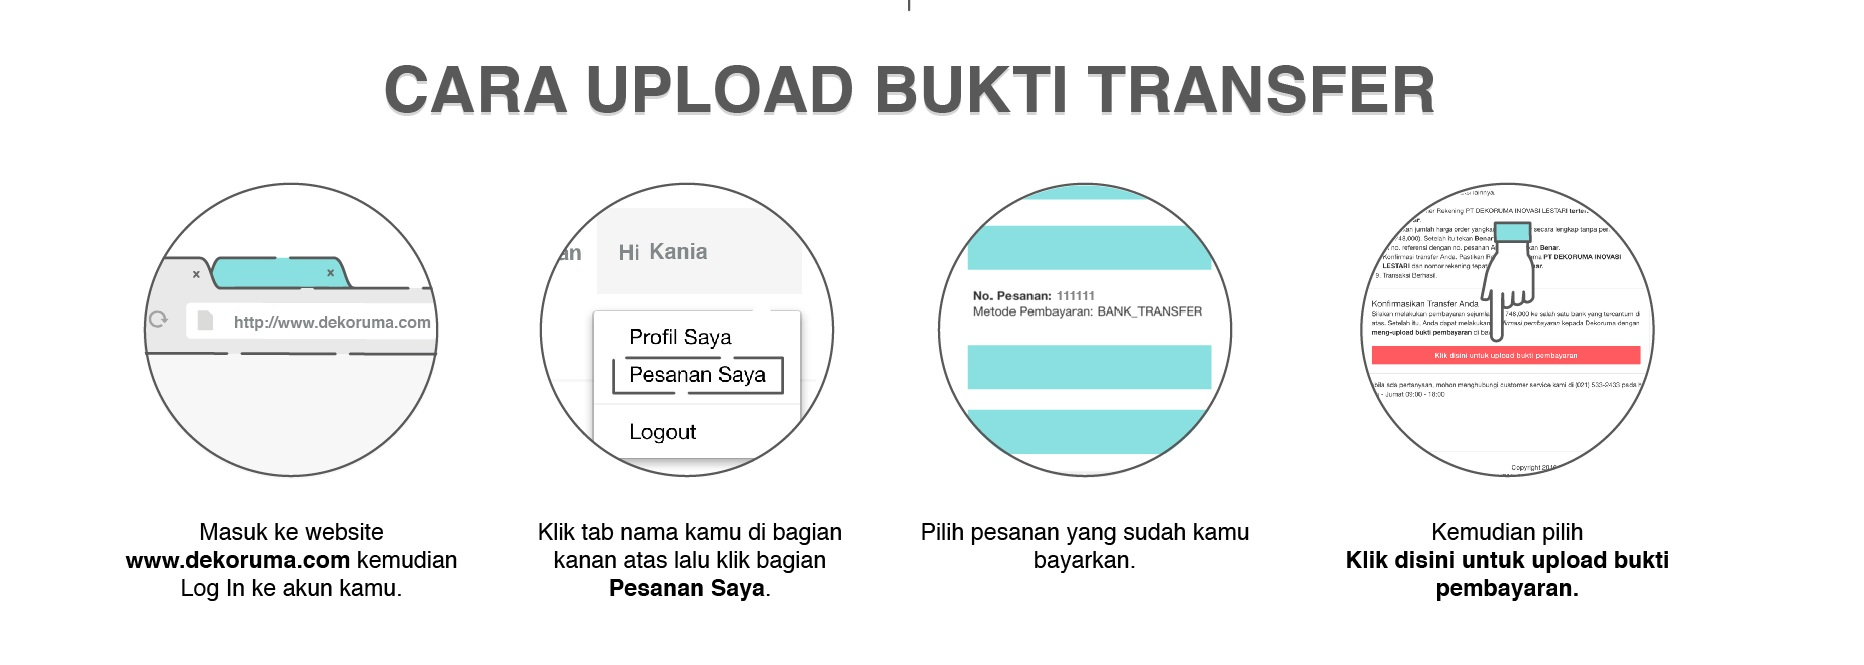 Metode Pembayaran Bank Transfer